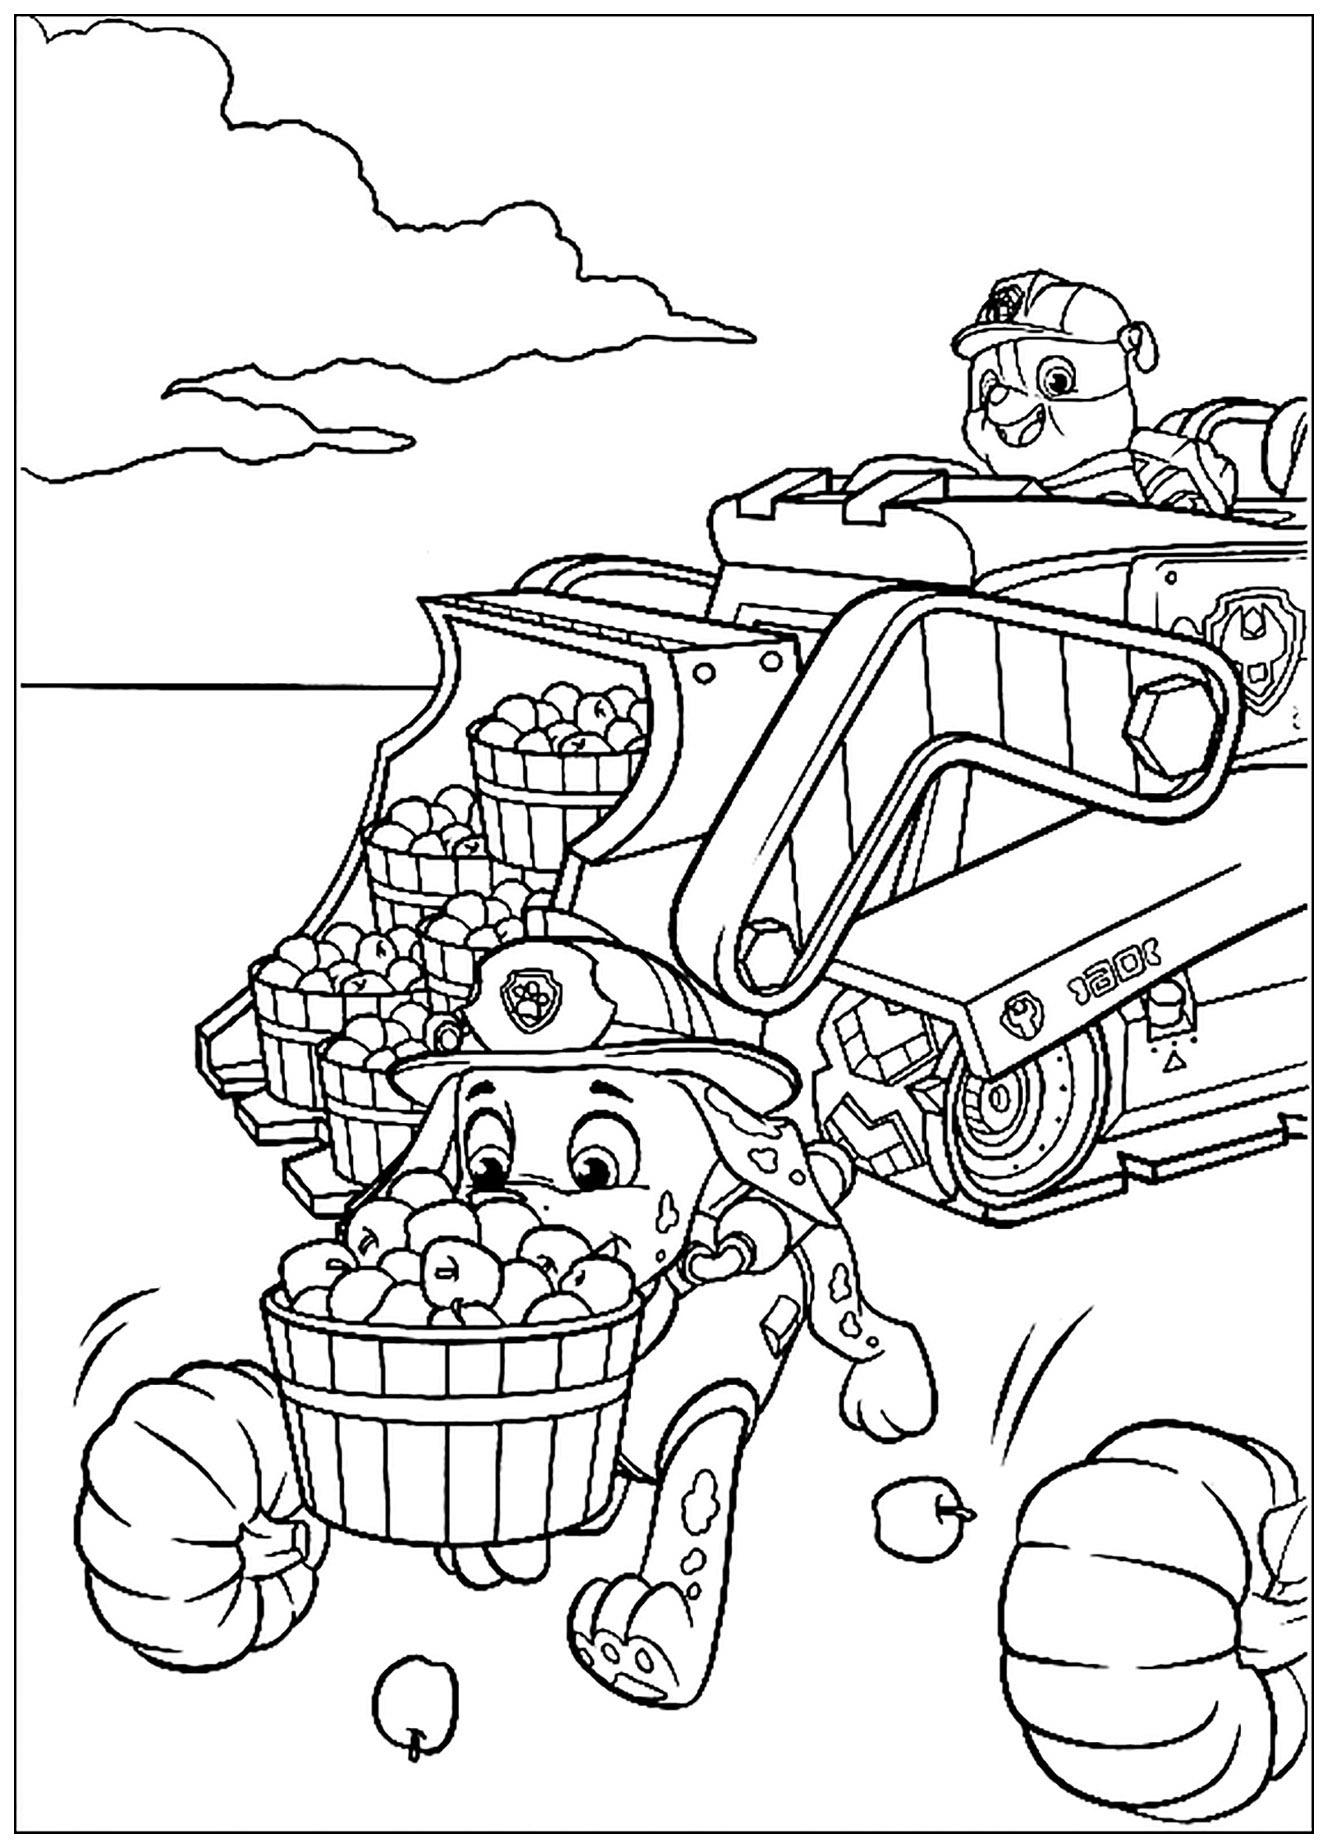 Simple Paw Patrol coloring page